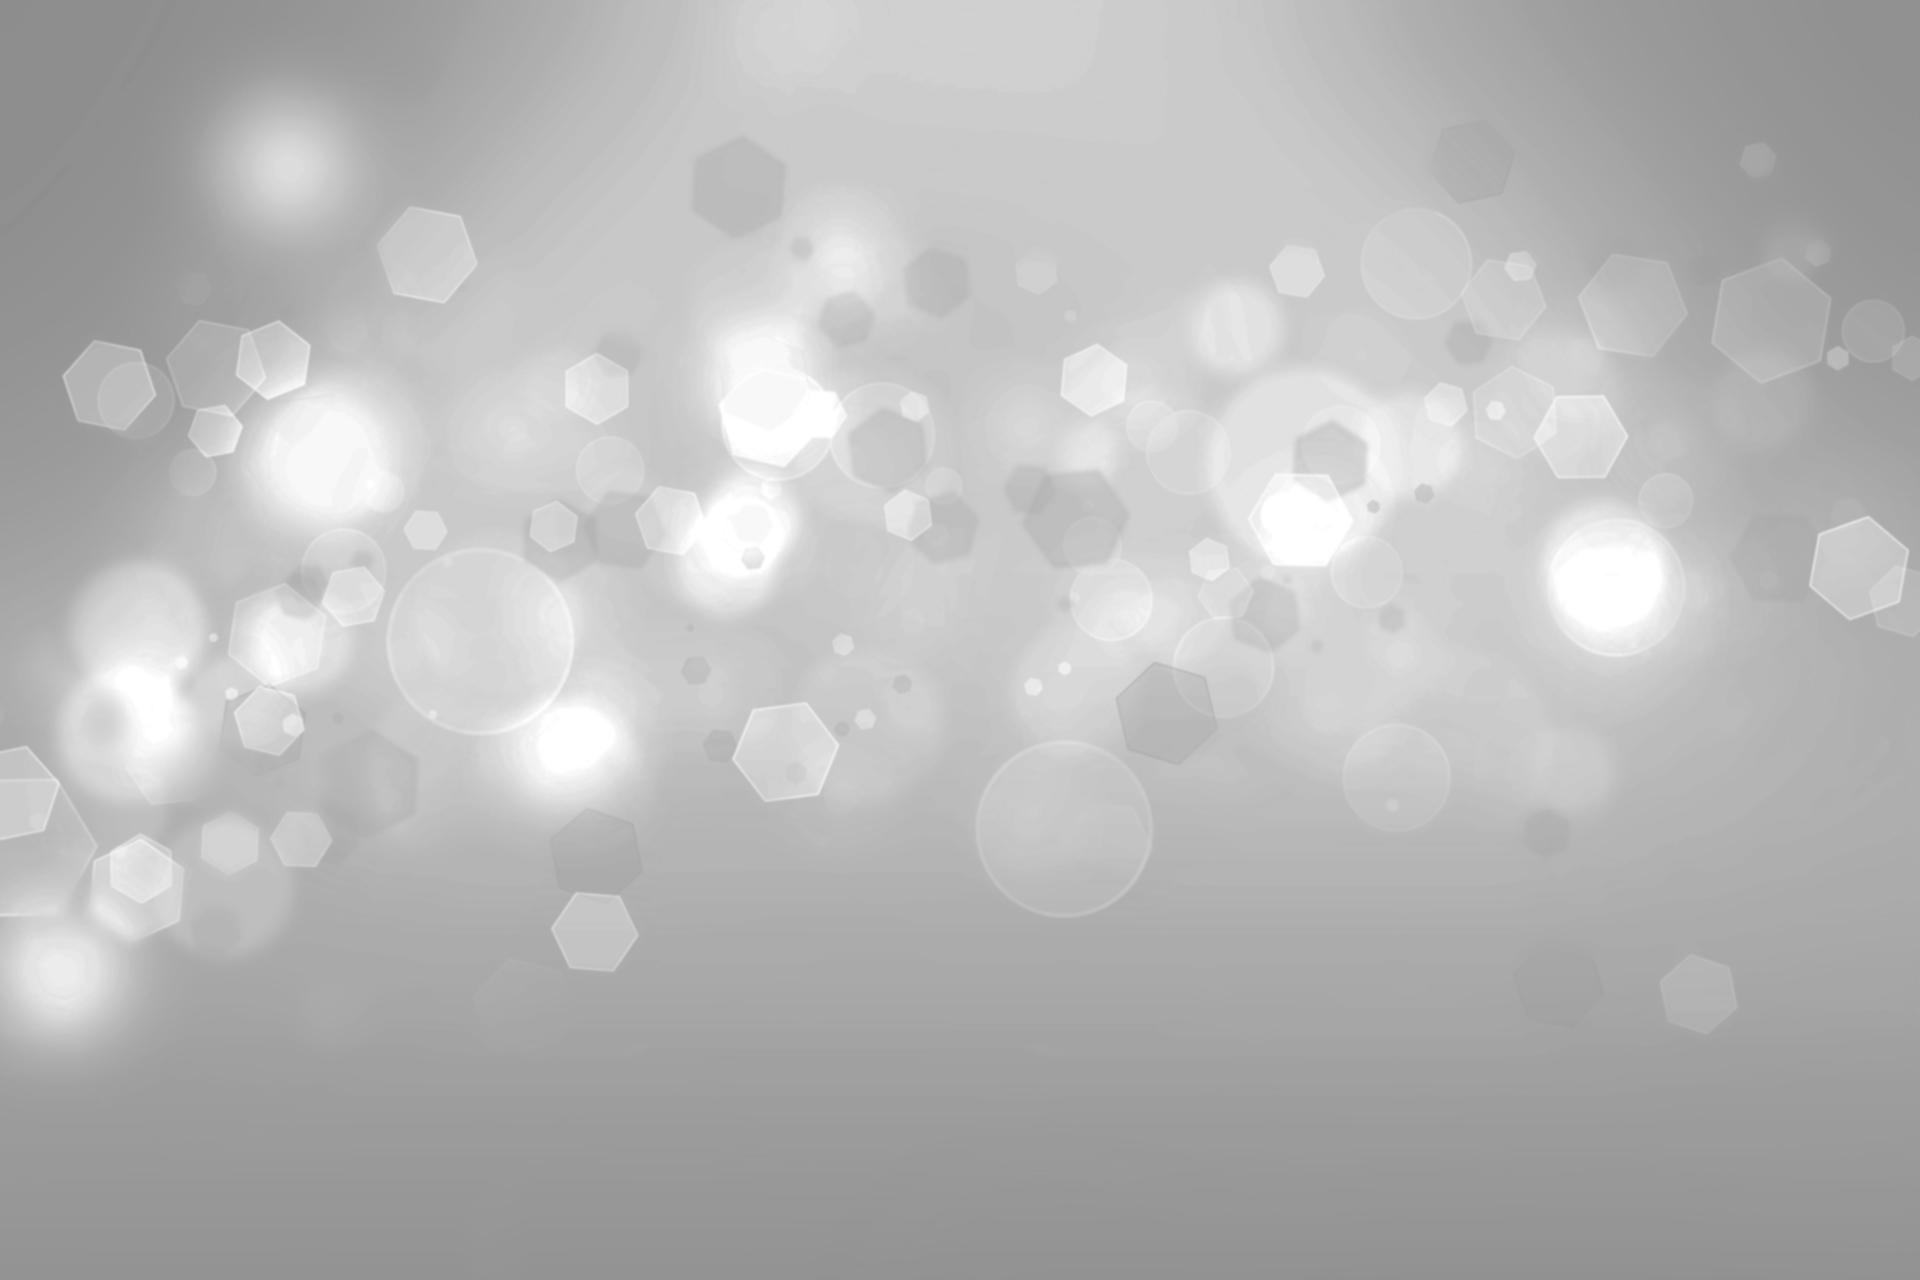 dentalia-demo-bg-lights